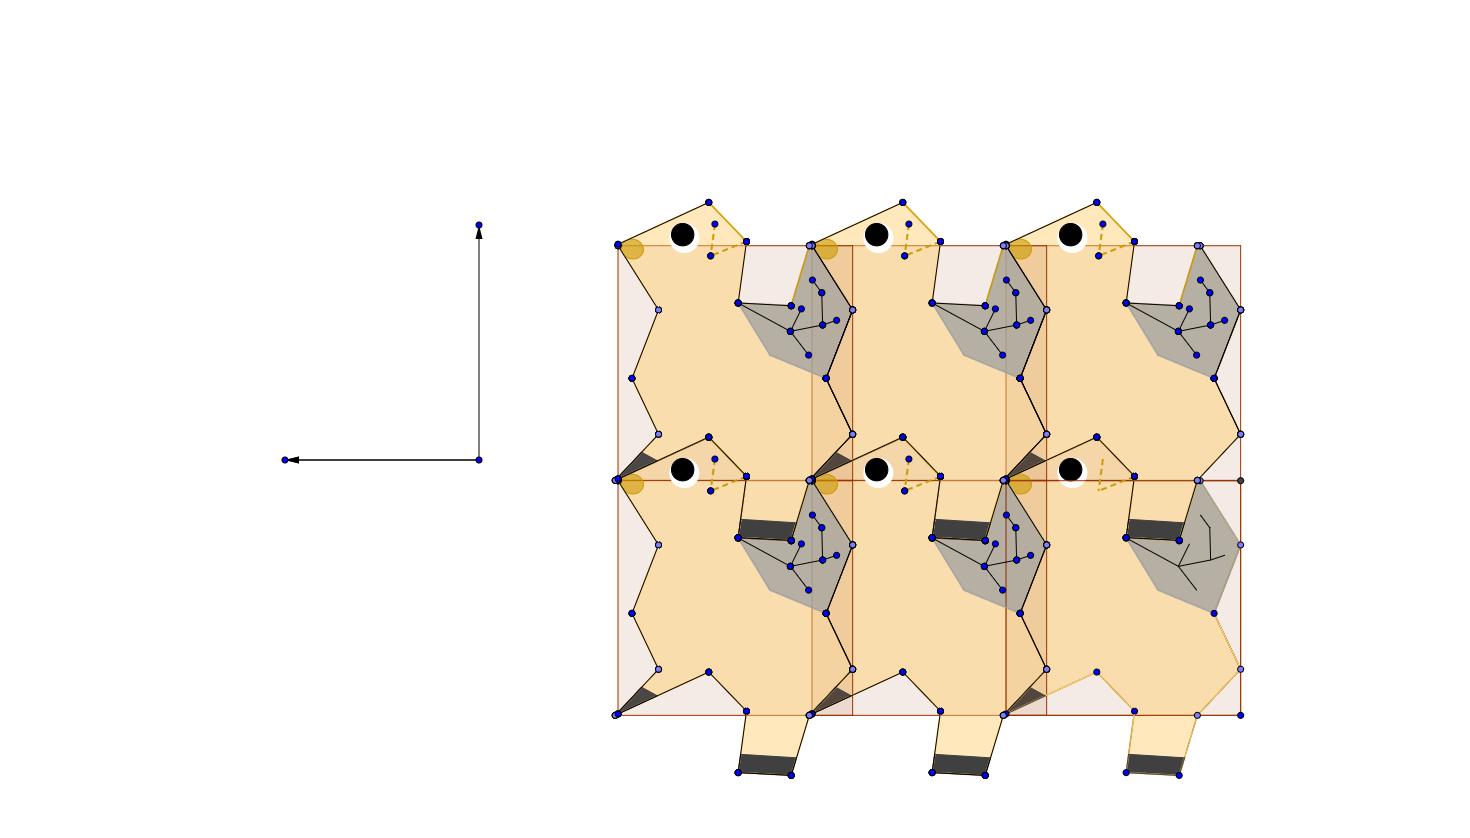 Tessellation Step 6: Creating a Tessellation Pattern